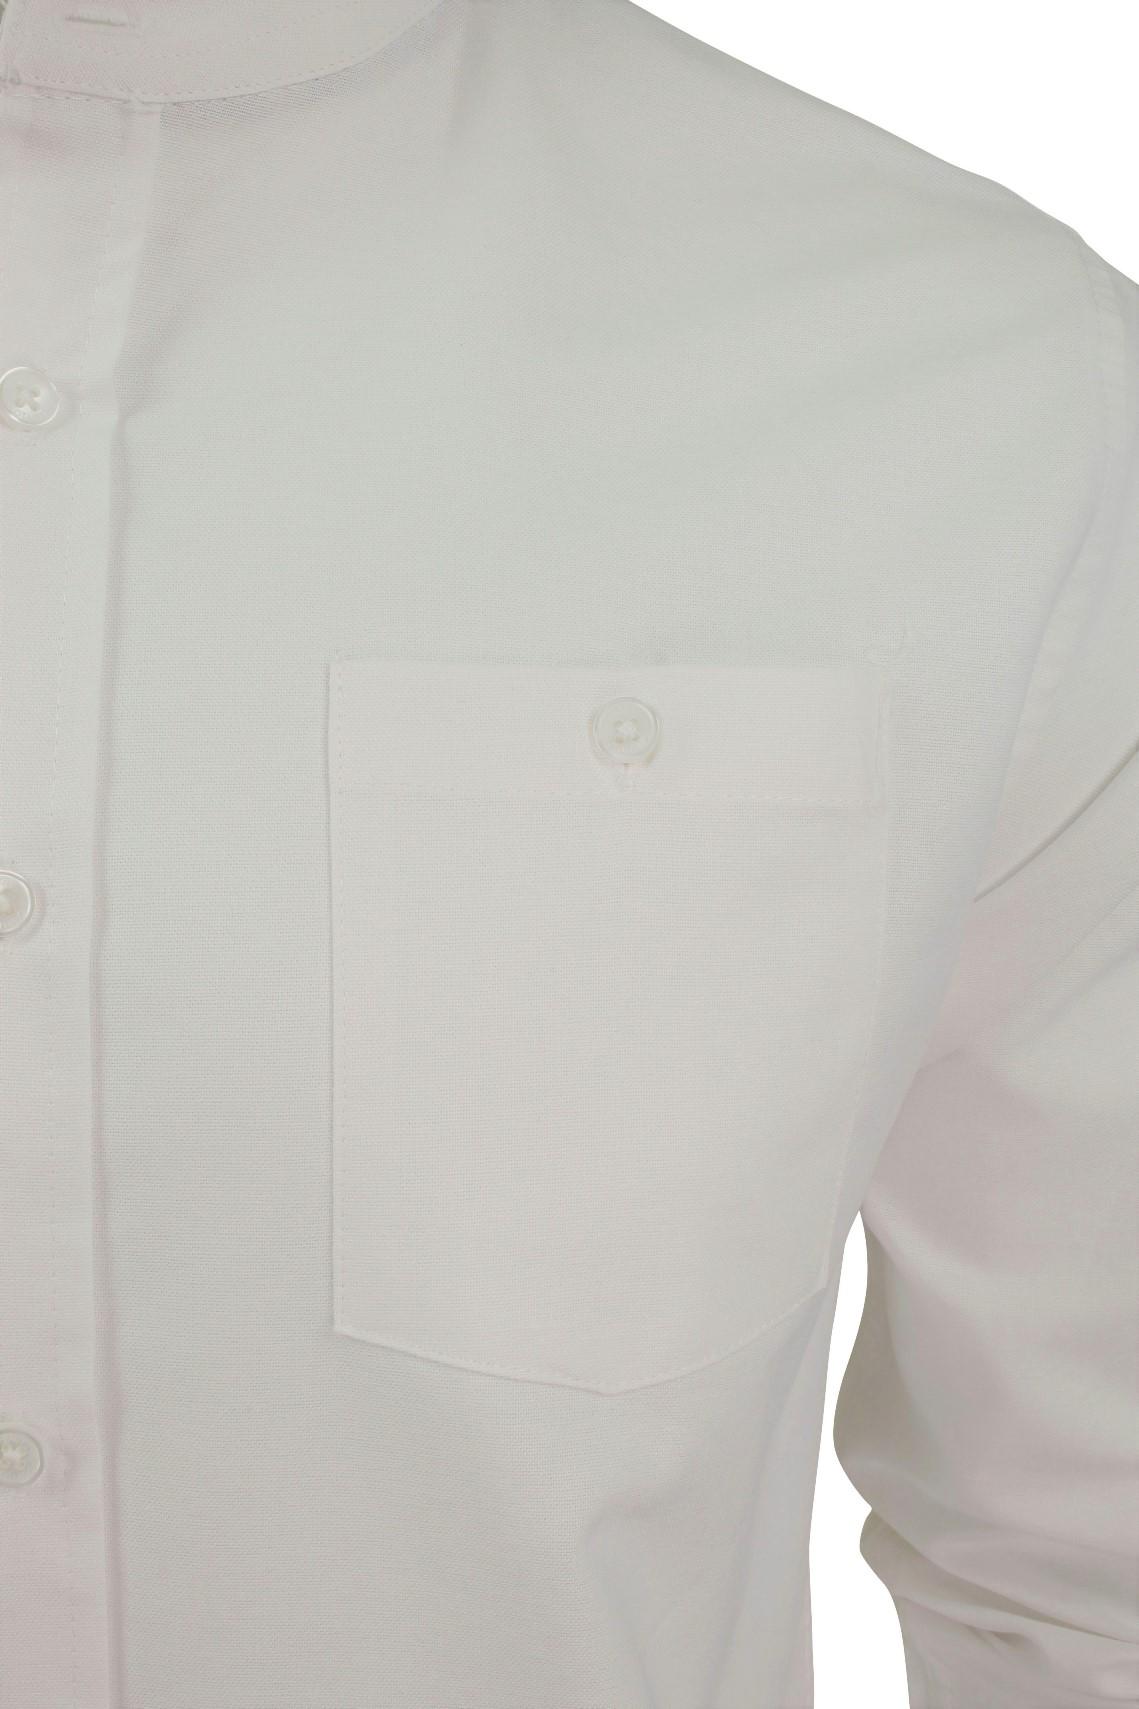 Xact-Mens-Grandad-Collar-Nehru-Oxford-de-Superdry-de-manga-larga-039-Augusto-039-s miniatura 7